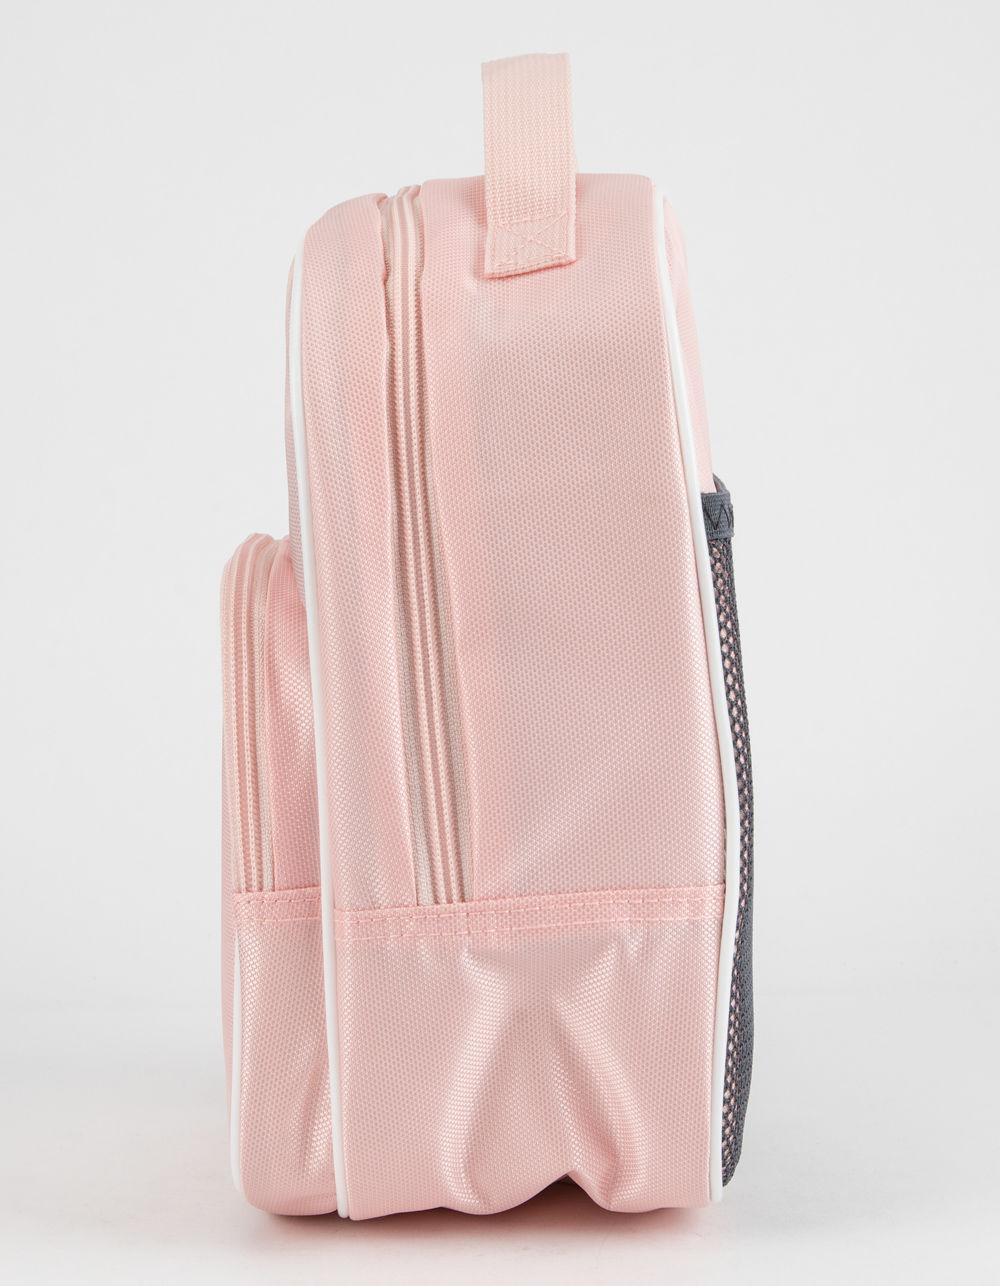 Adidas - Originals Santiago Pink Lunch Bag - Lyst. View fullscreen 10b3612dce